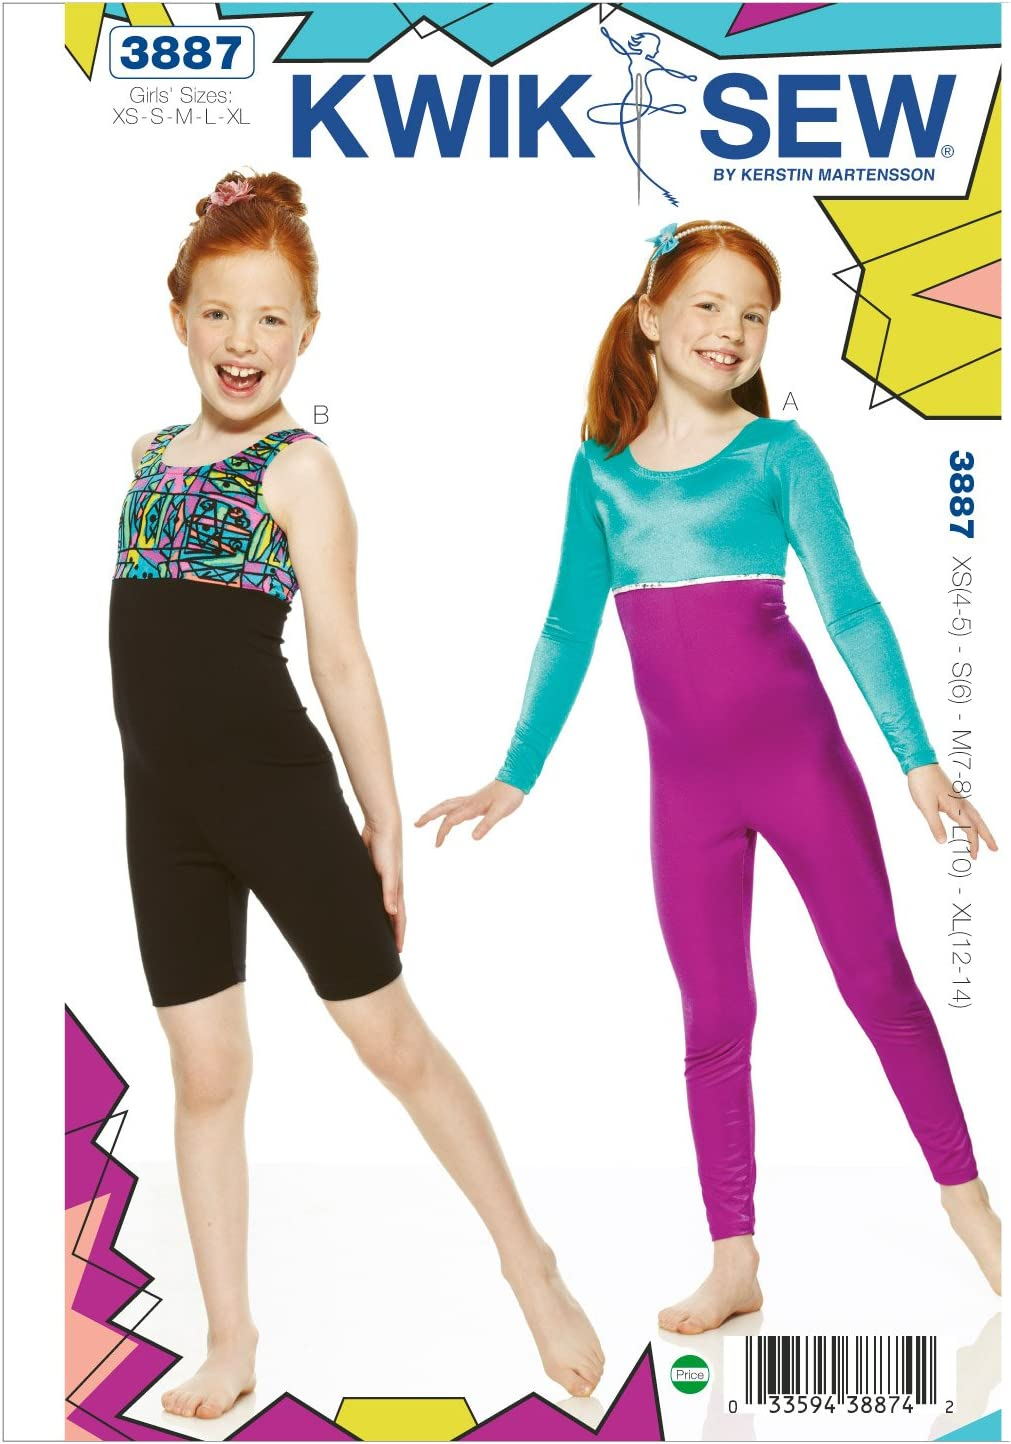 Kwik Sew K3887 Unitard Sewing Pattern, Size XS-S-M-L-XL